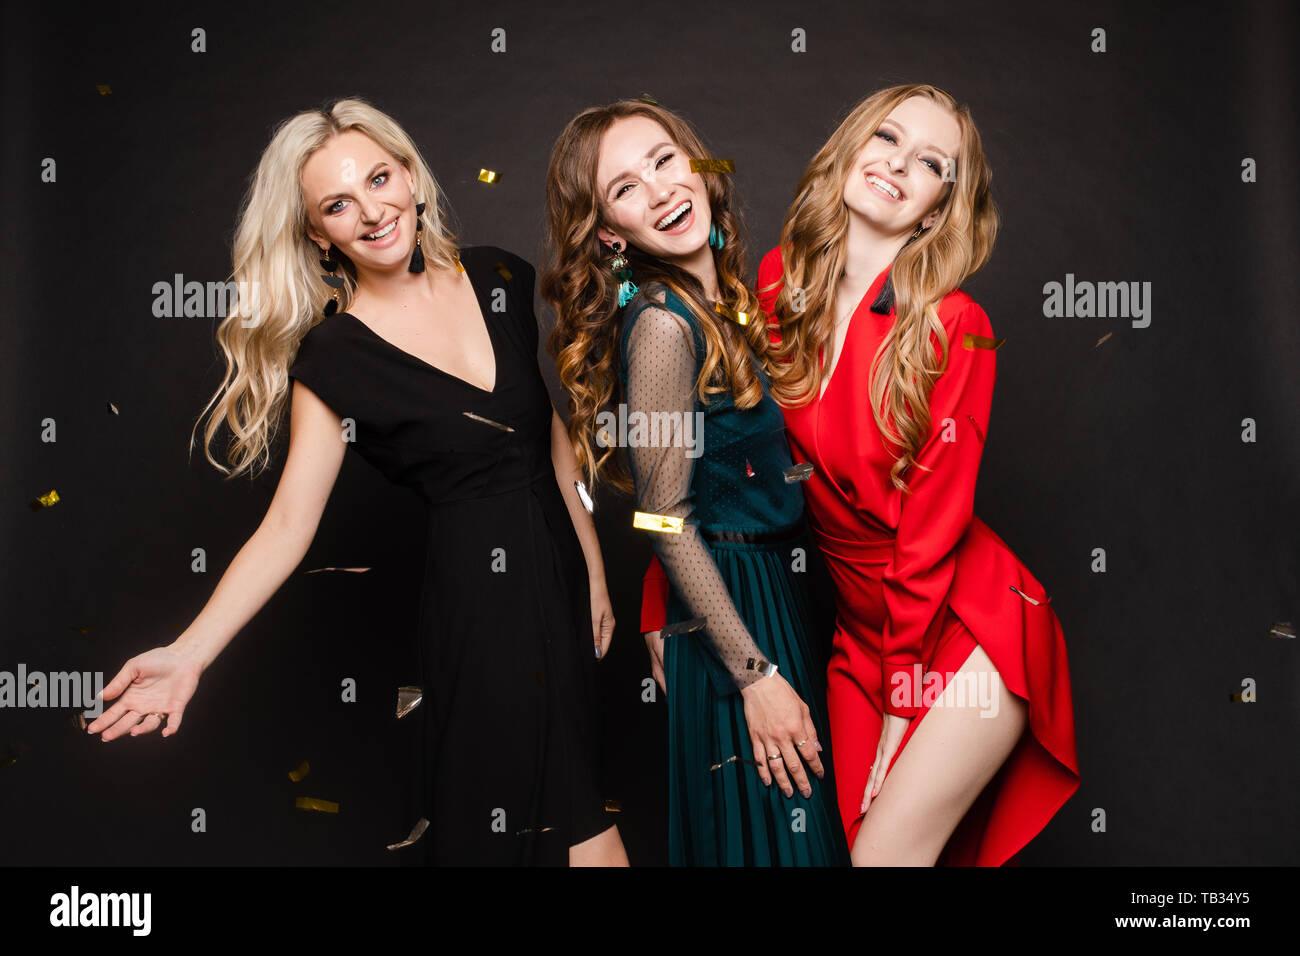 Three gorgeous ladies in evening dresses having fun on black background. Stock Photo